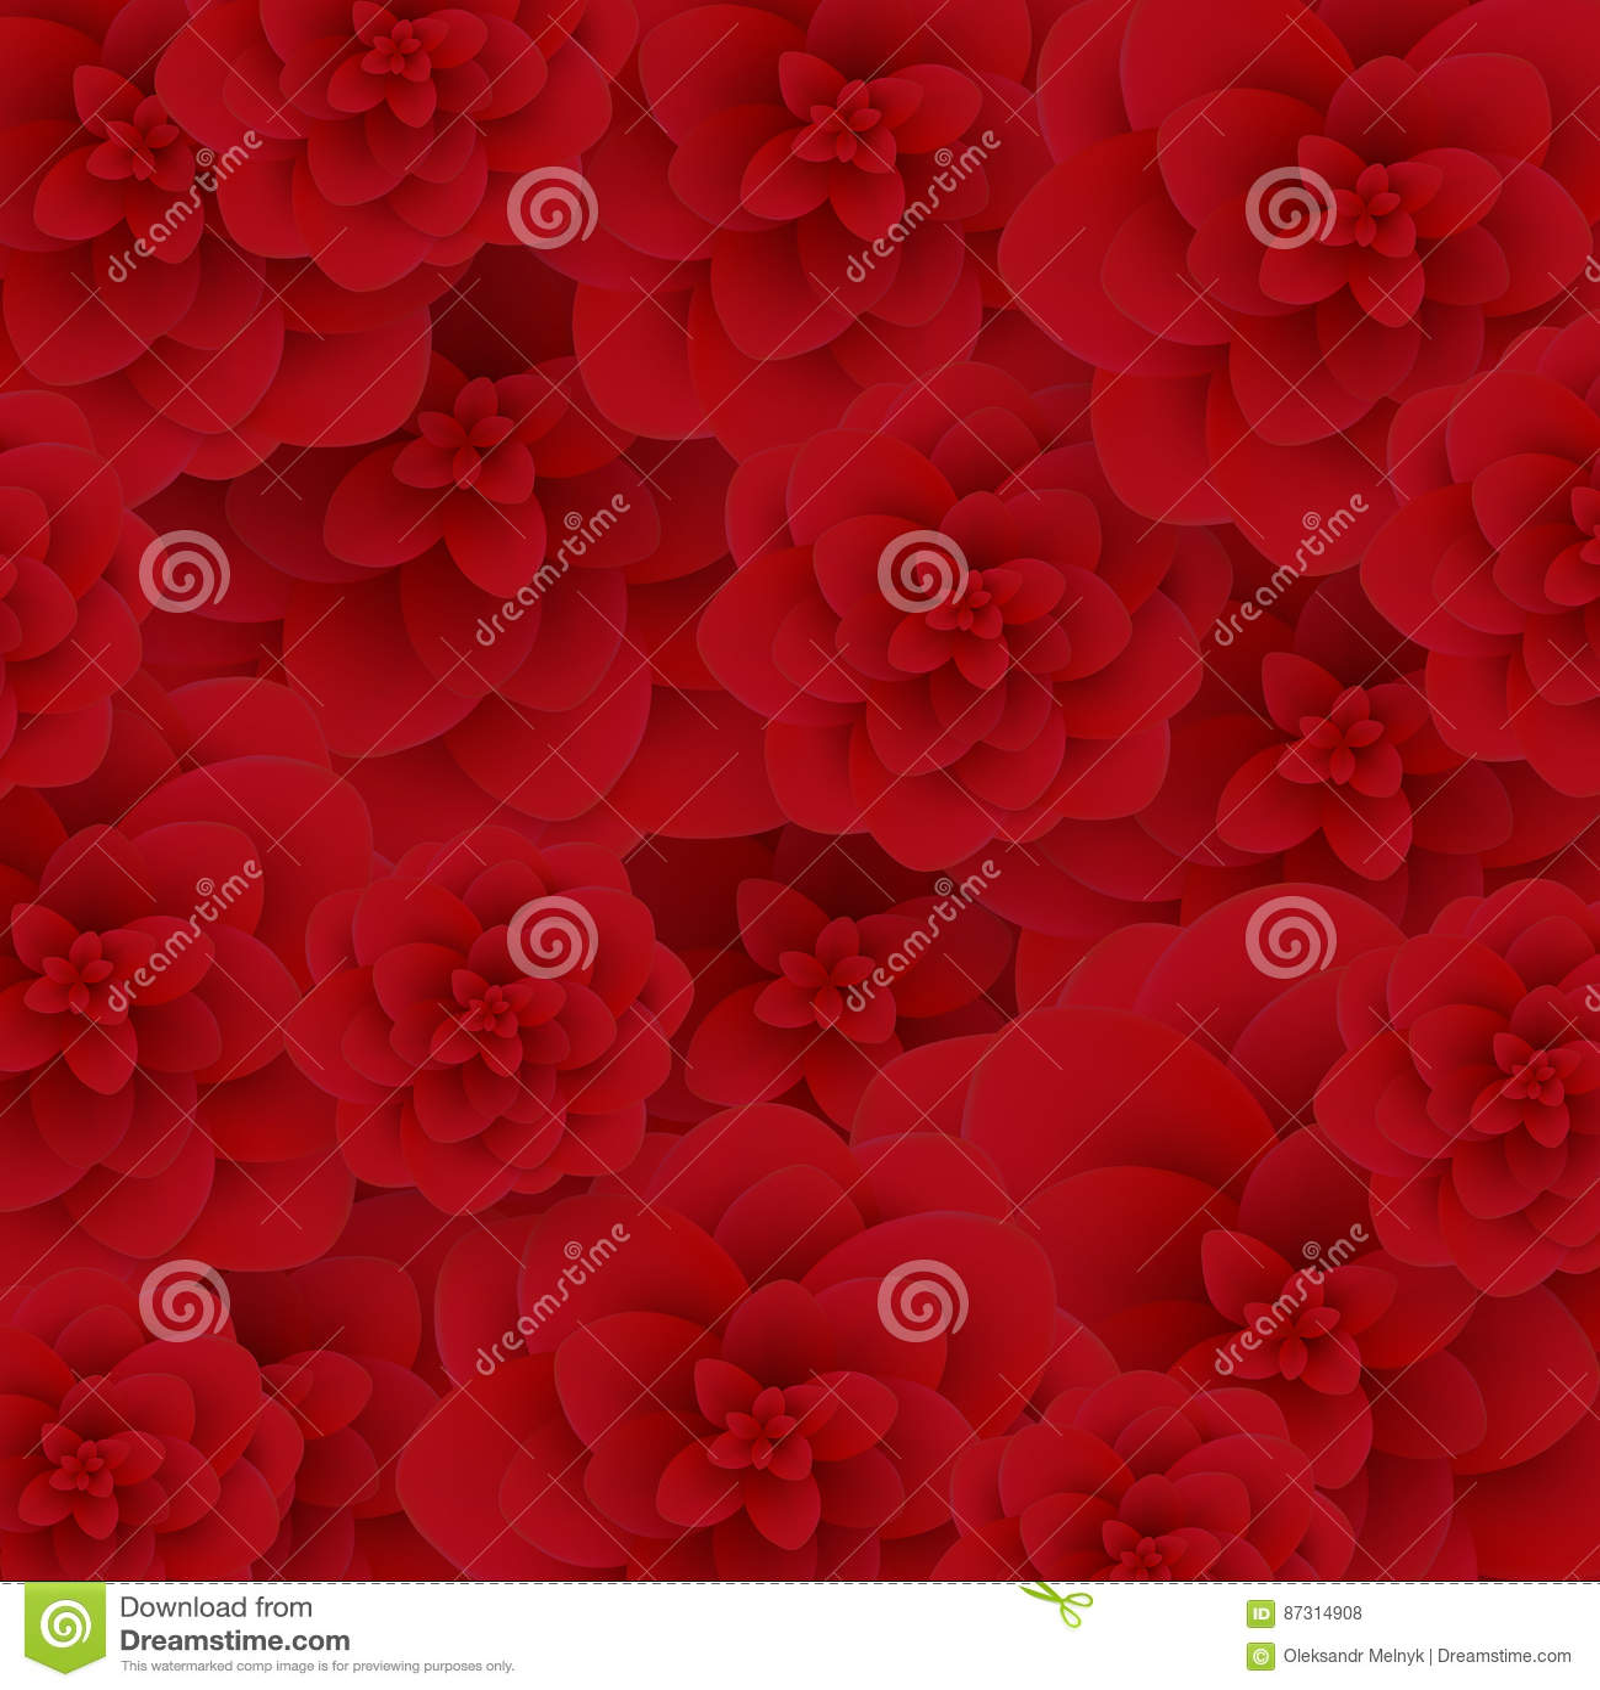 Seamless Wallpaper Pattern Red Roses On Design Background Vector Illustration